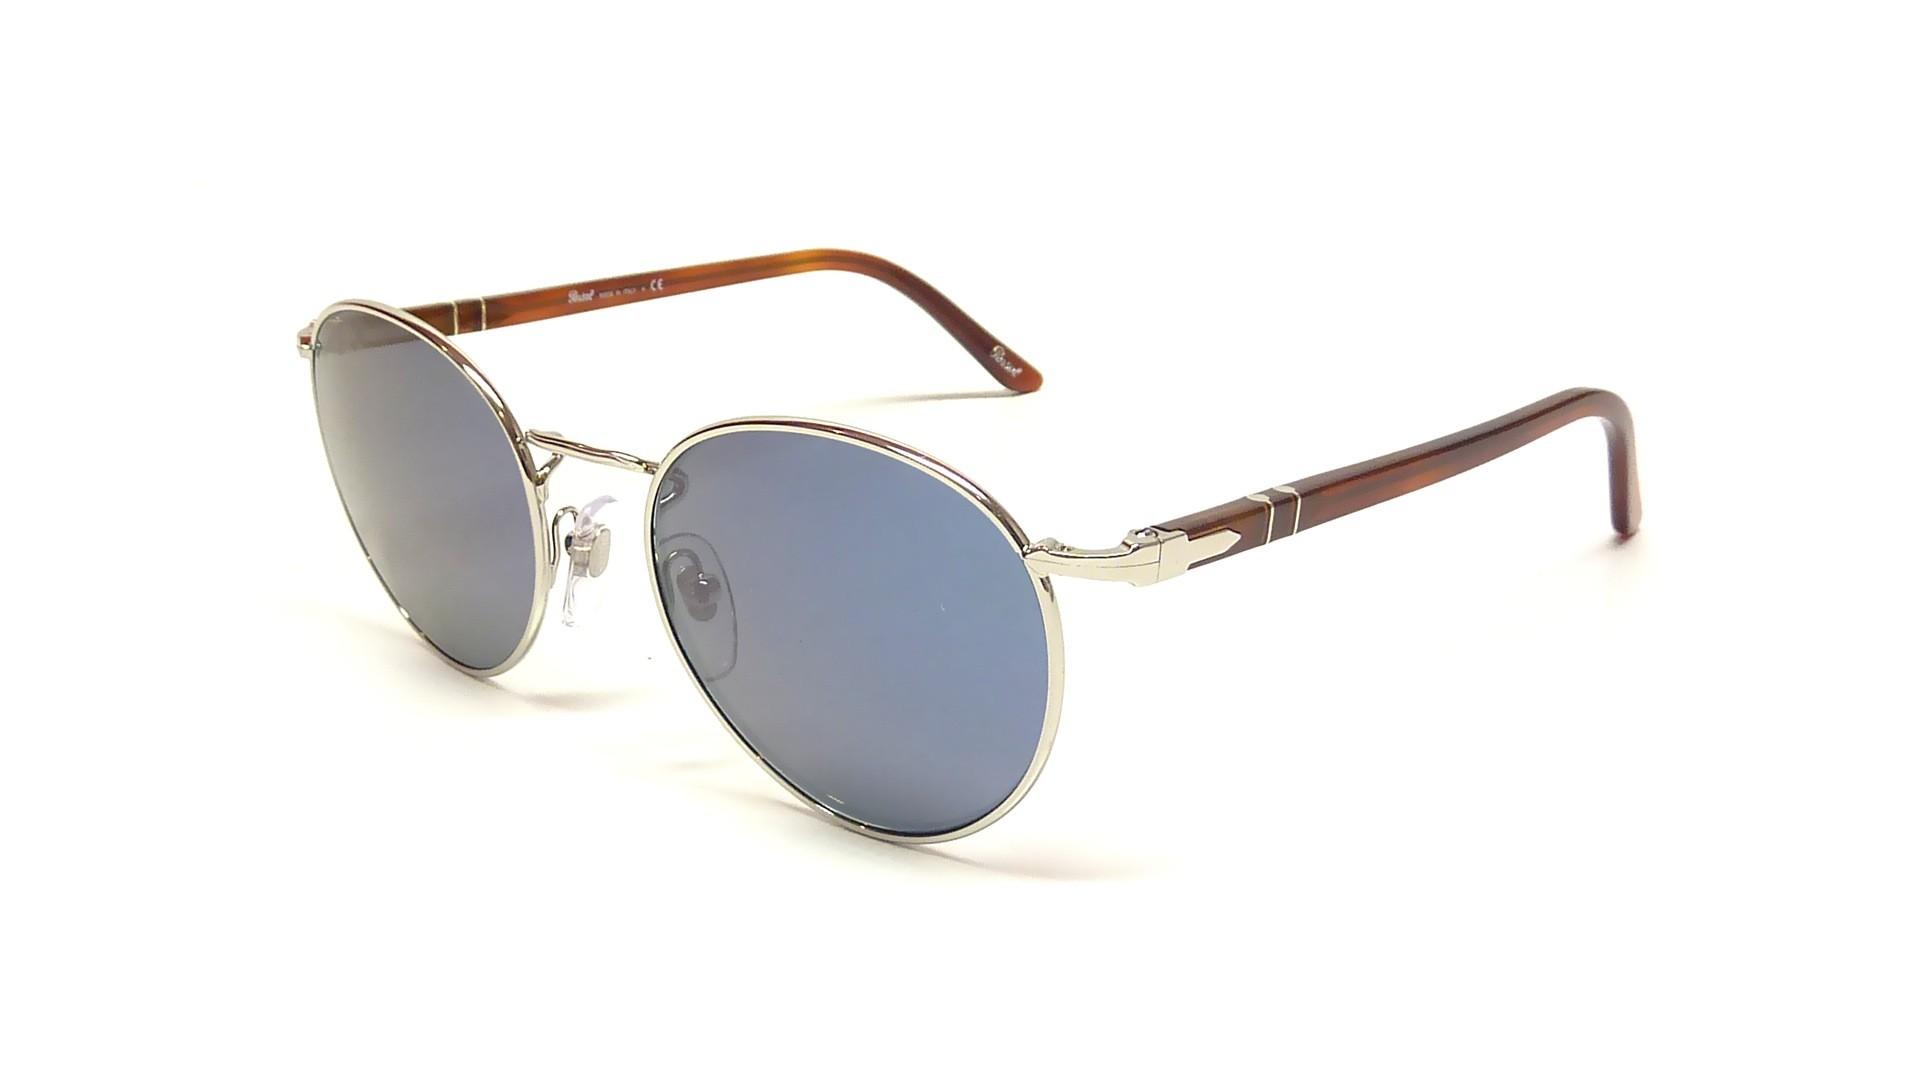 ea27531b8e Persol Men s Polarized Sunglasses Medium - Bitterroot Public Library